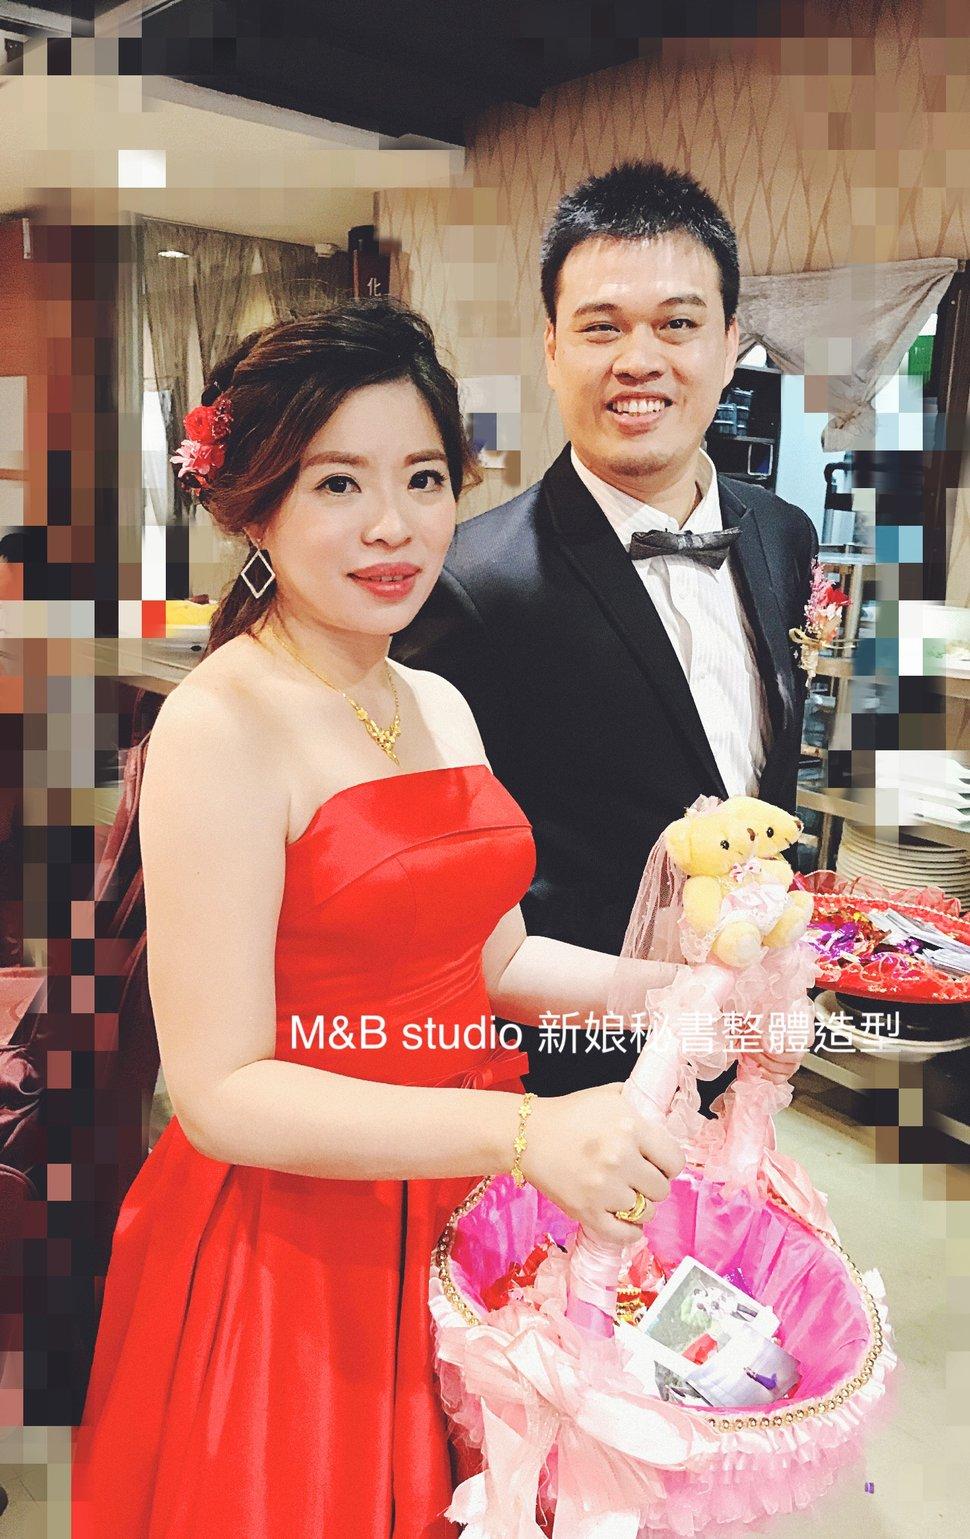 IMG_2241 - M&B STUDIO 新娘秘書整體造型 - 結婚吧